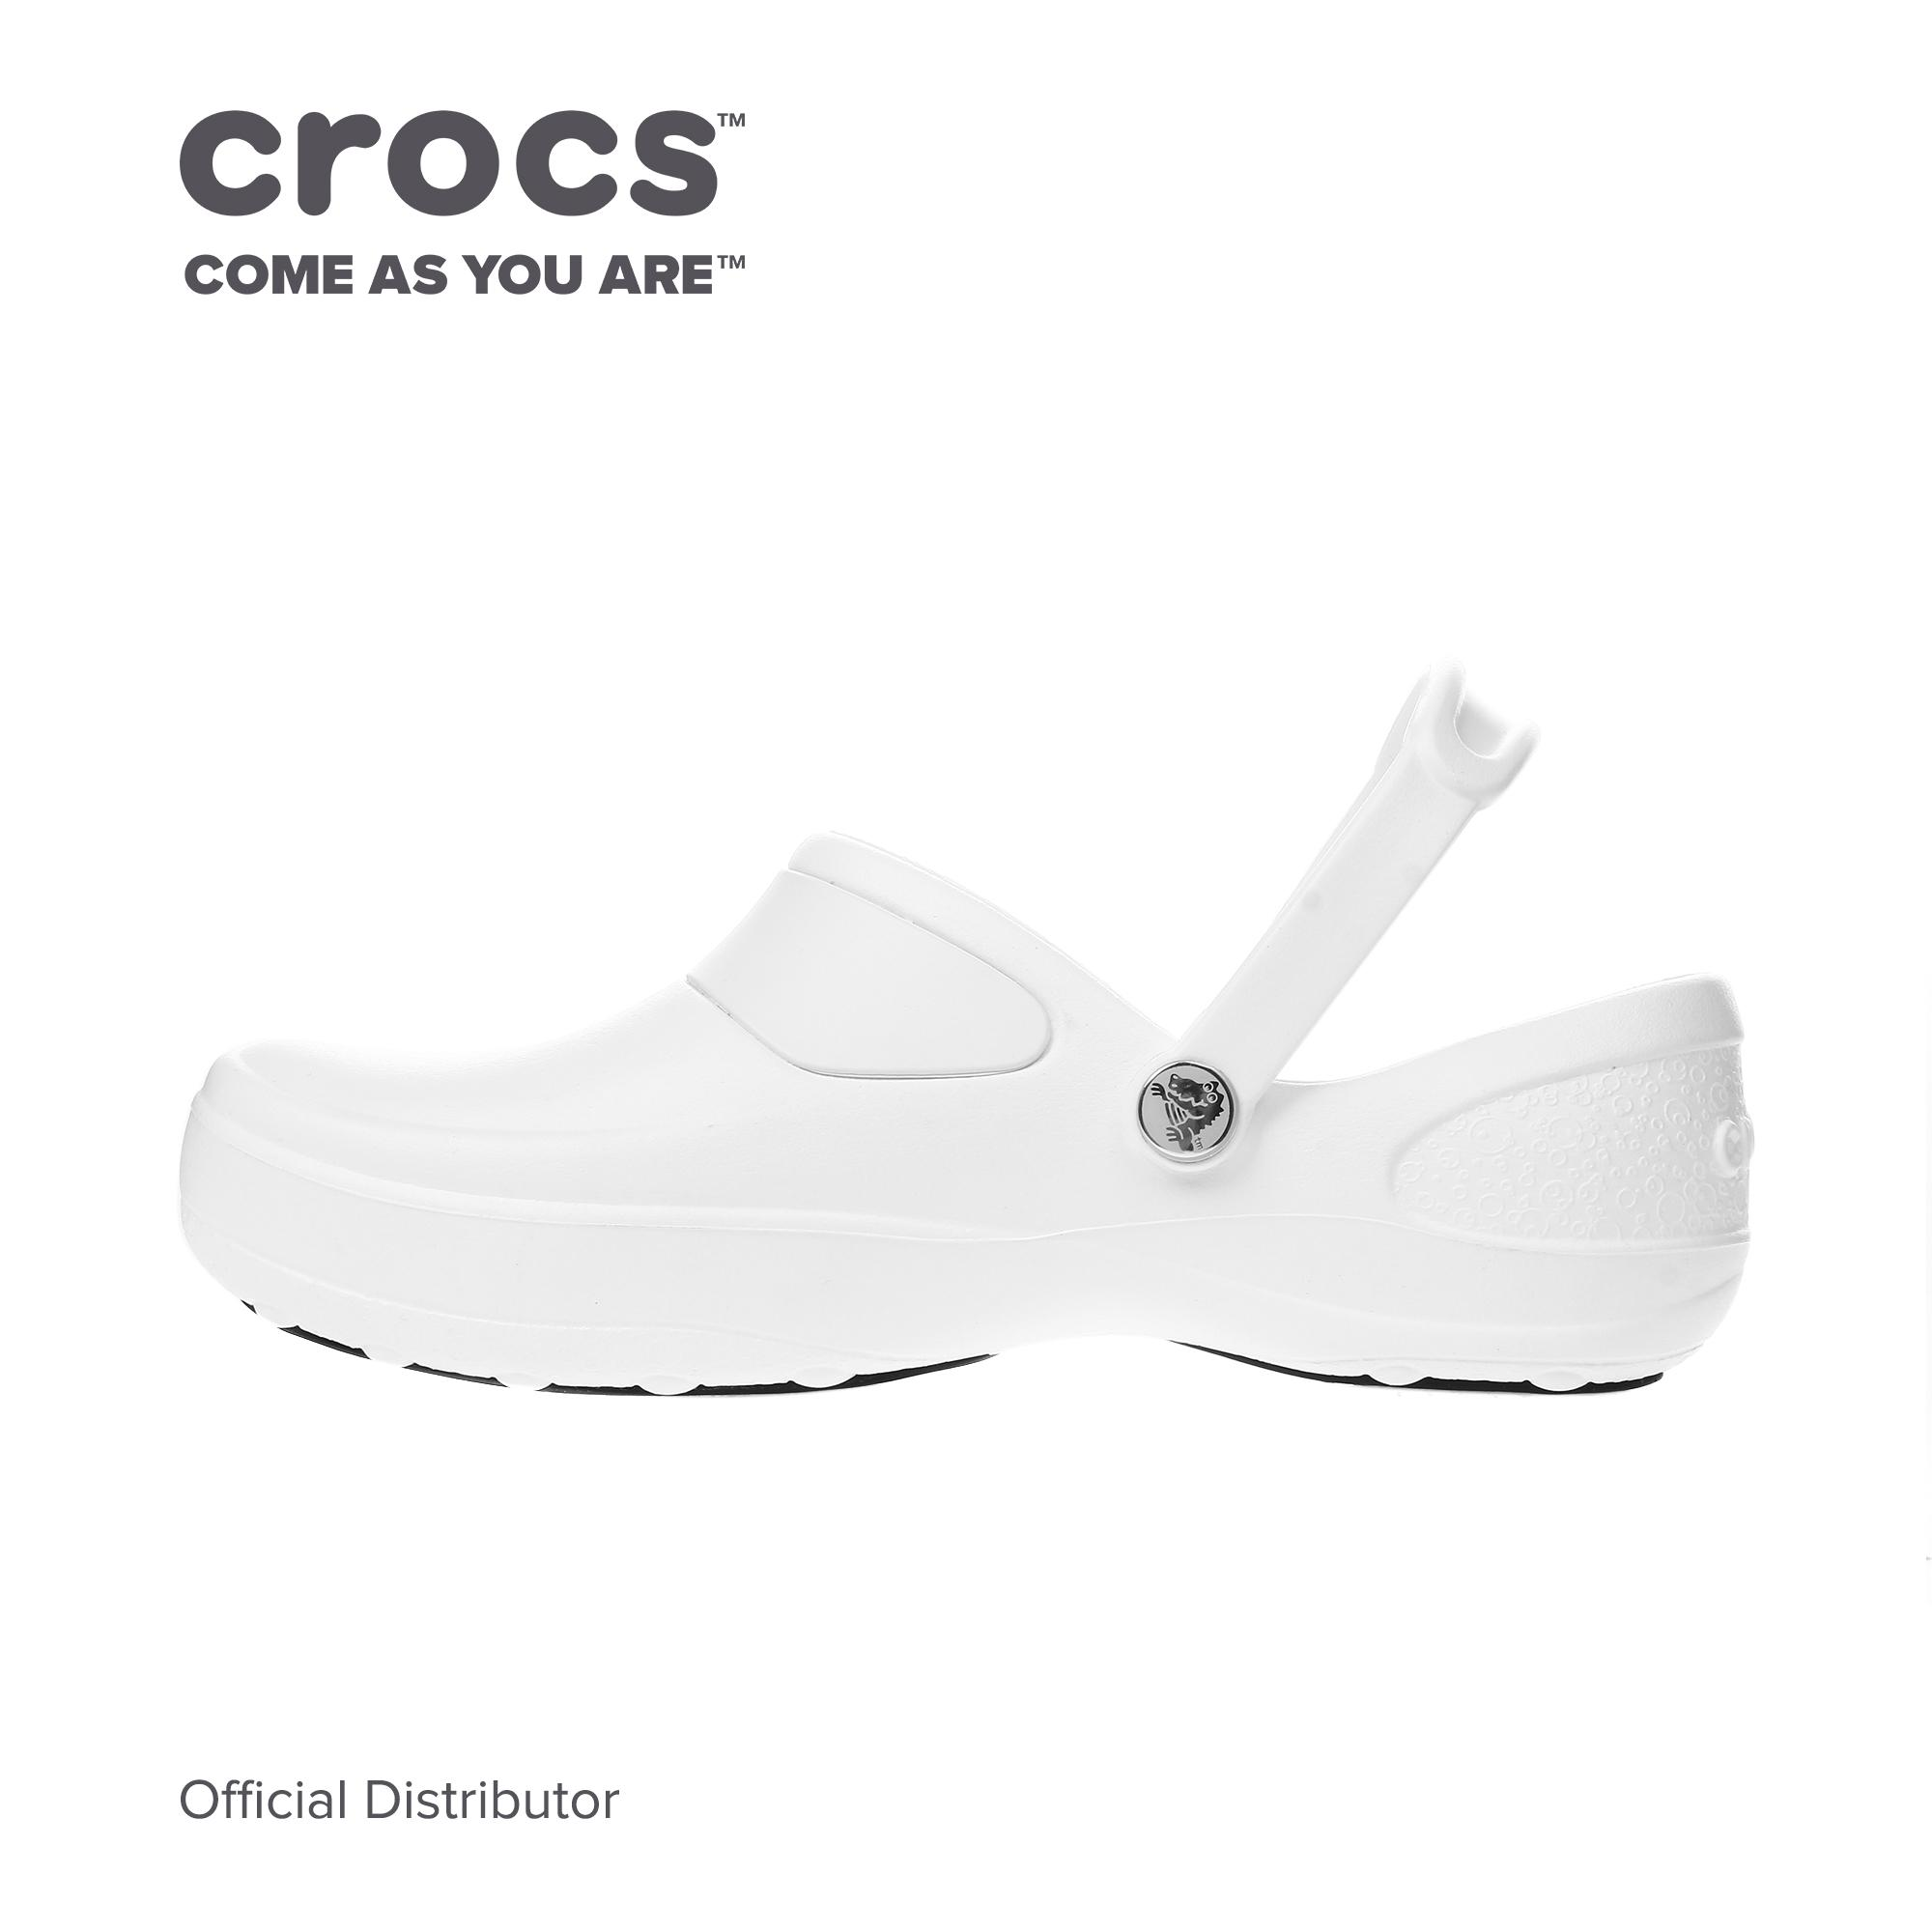 Crocs Women's Mercy Work Clog: Buy sell